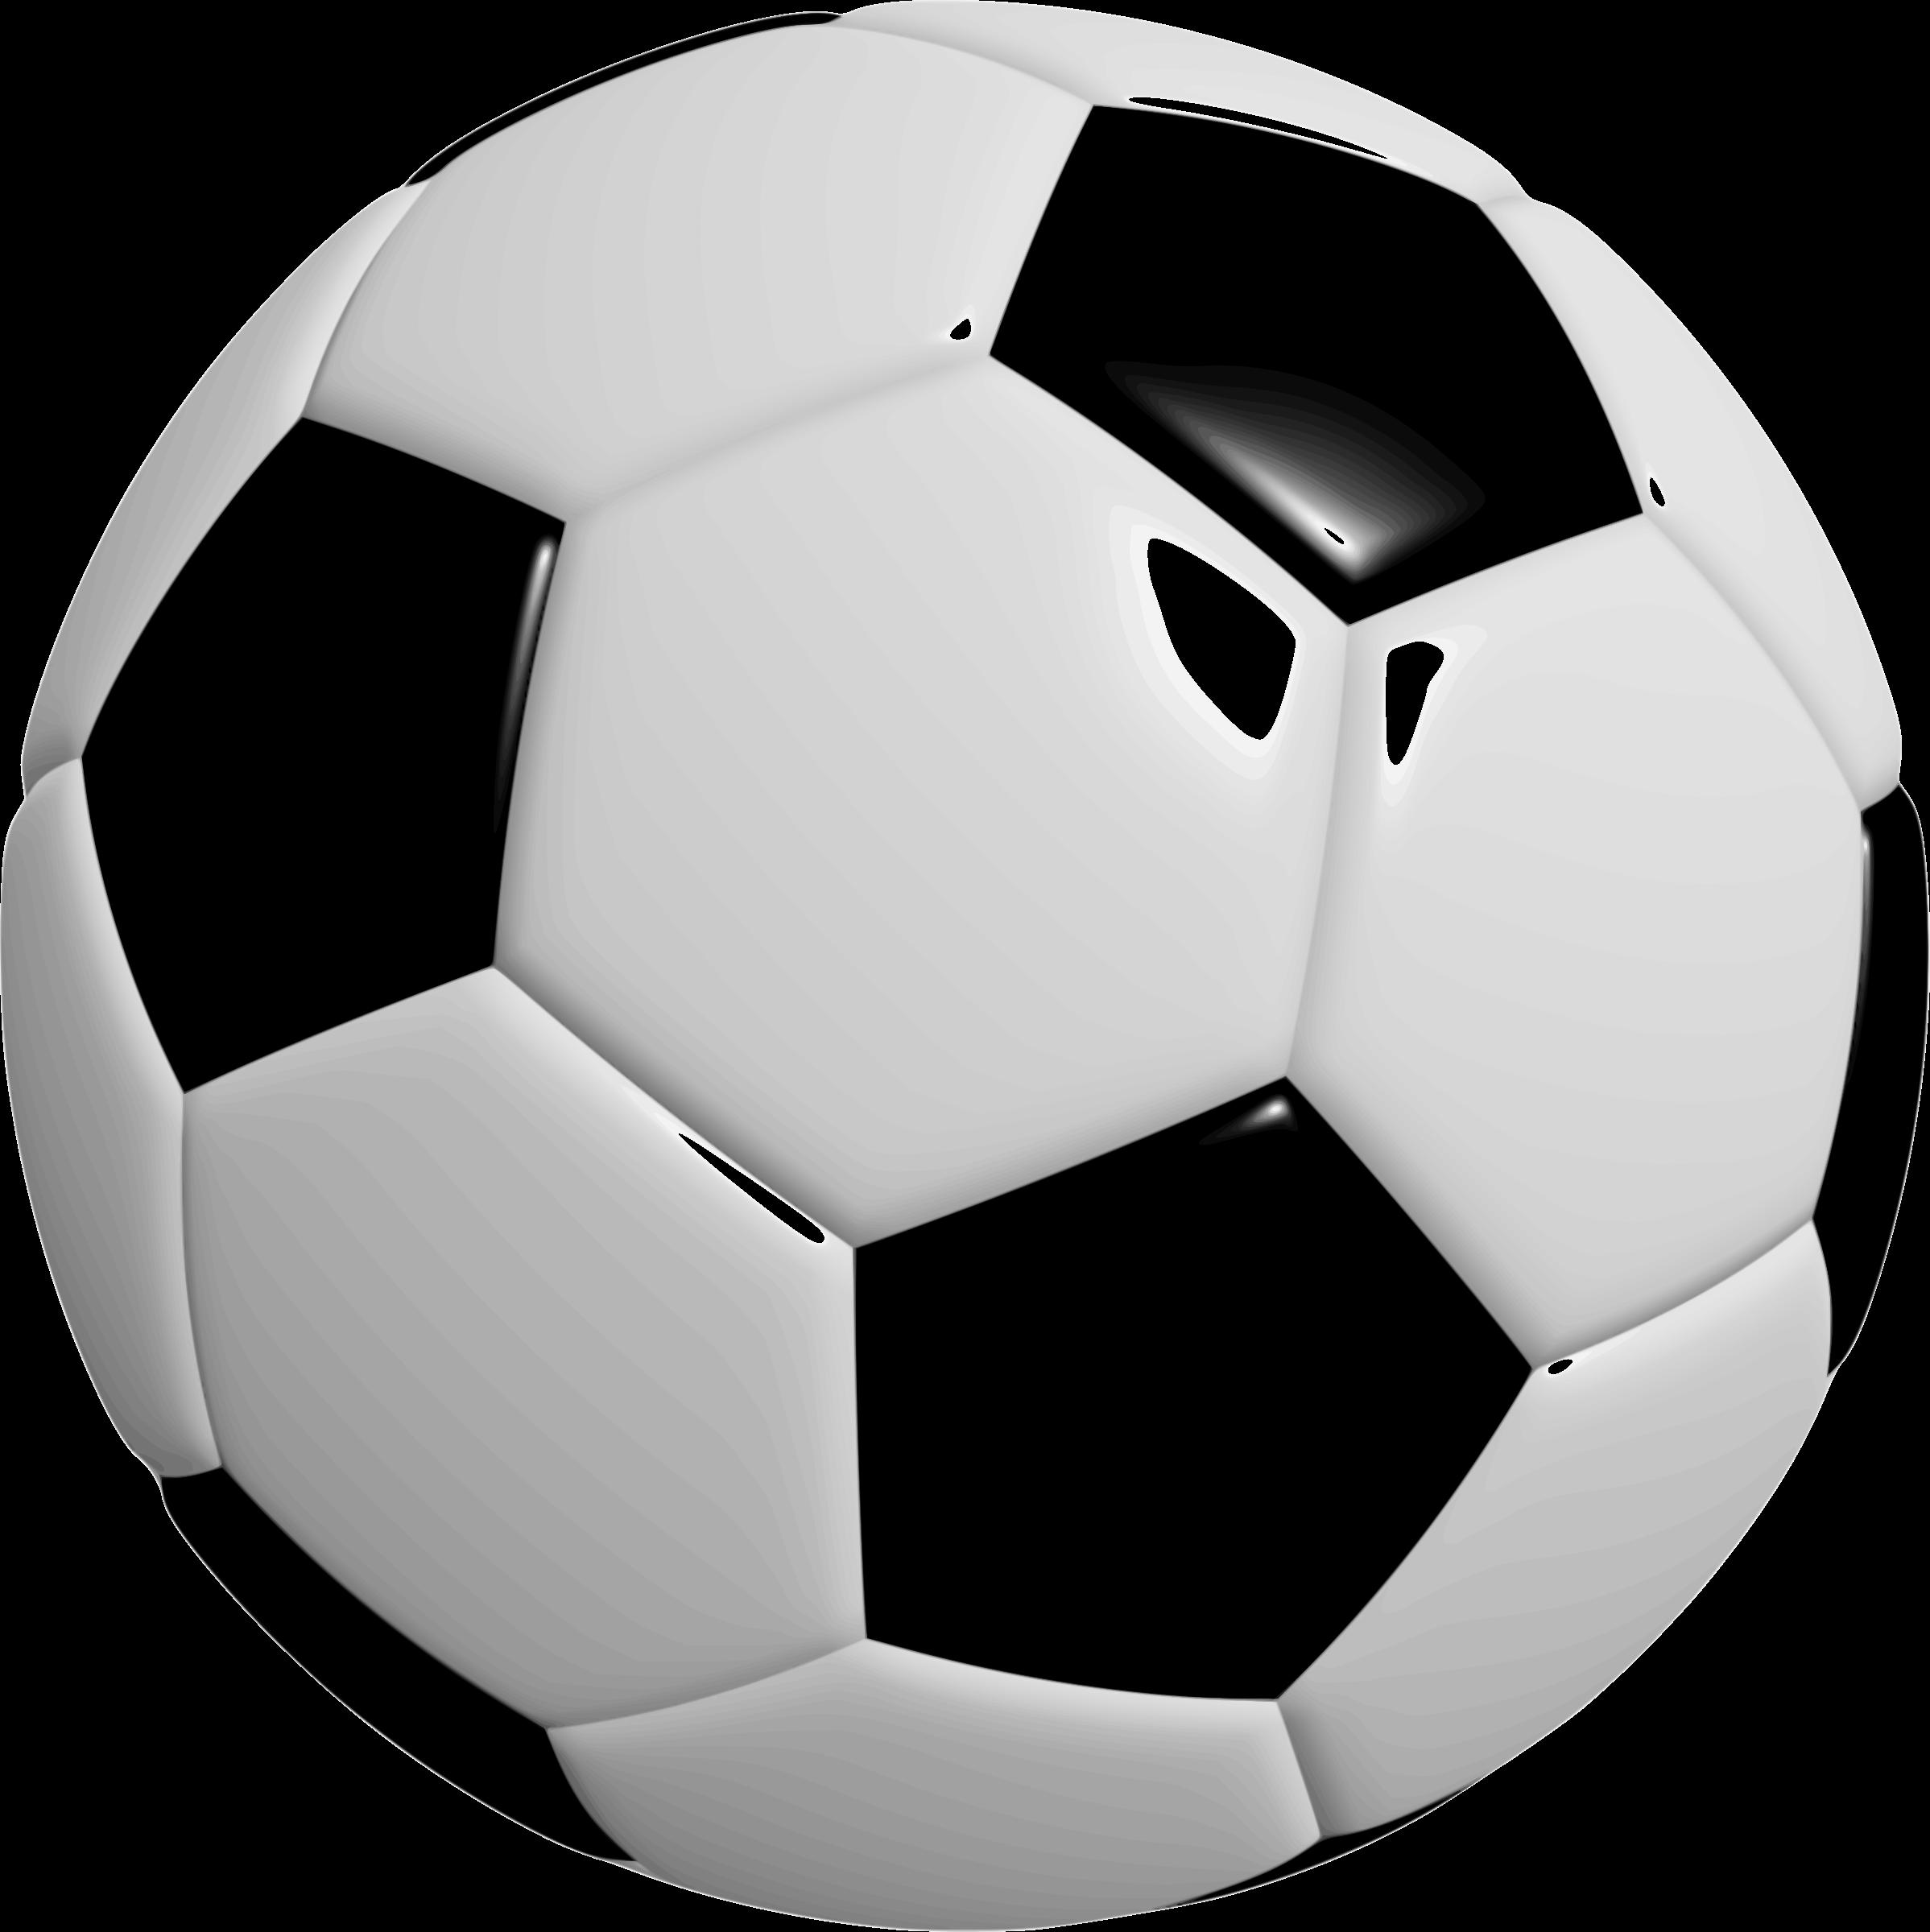 football / soccer ball by Tobbi, football modeled using